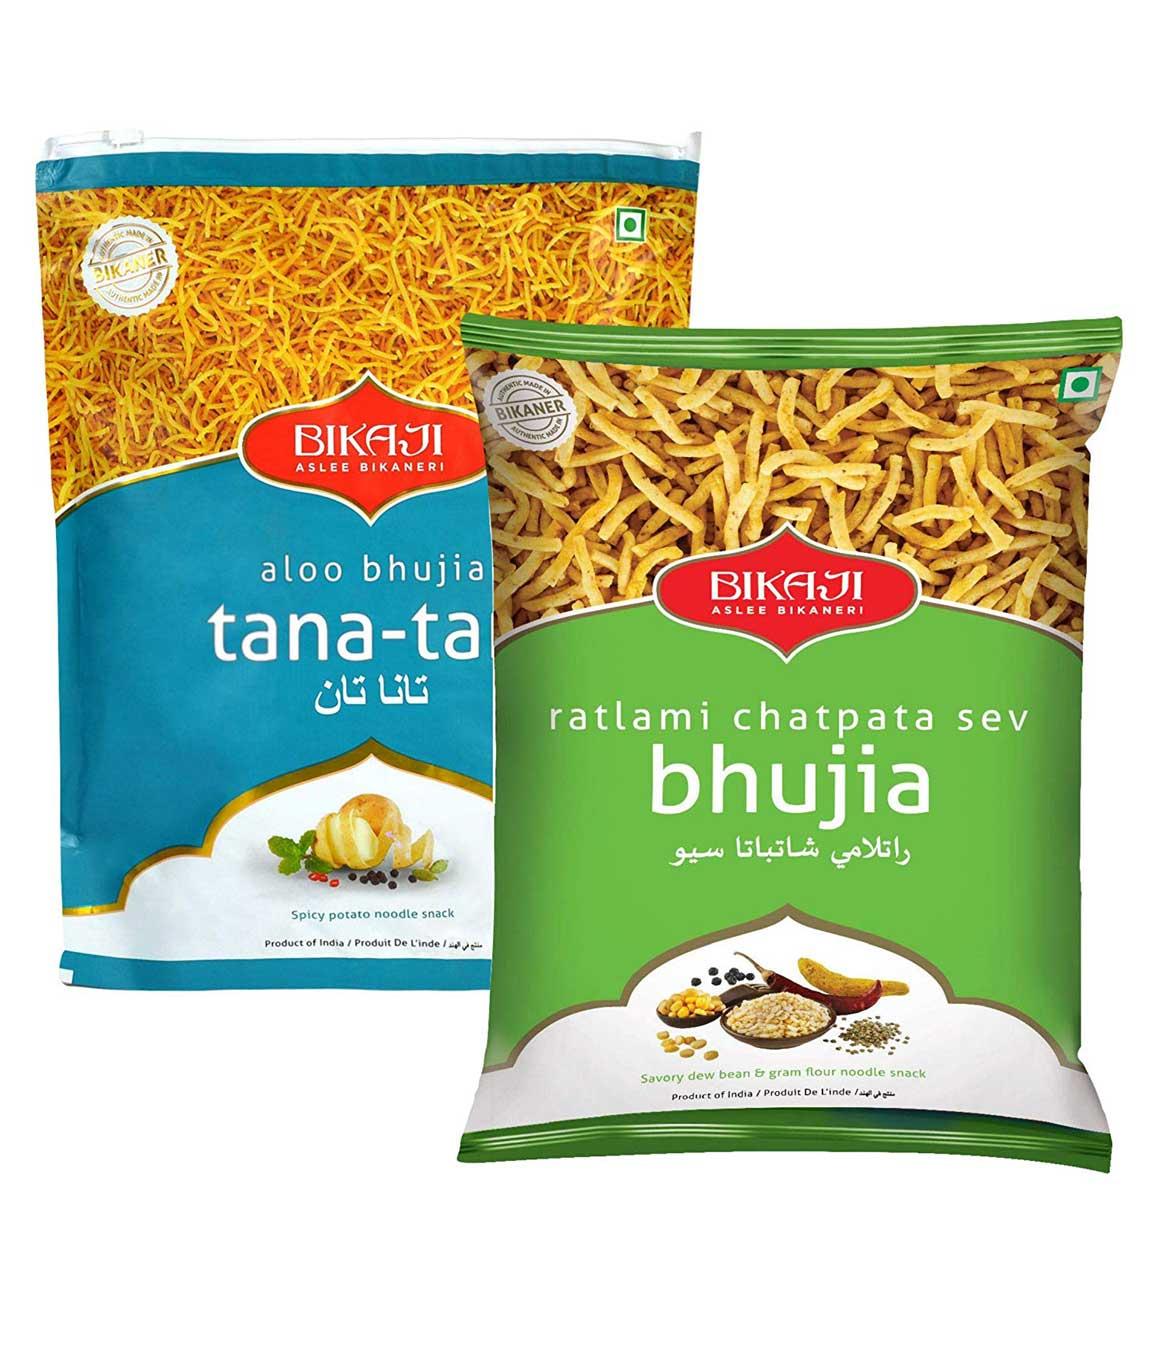 Bikaji Combo Pack - Aloo Bhujia Tana-Tan 400gm - Ratlami Chatpata Sev Bhujia 400gm - Indian Namkeen Snacks - (Pack of 2)